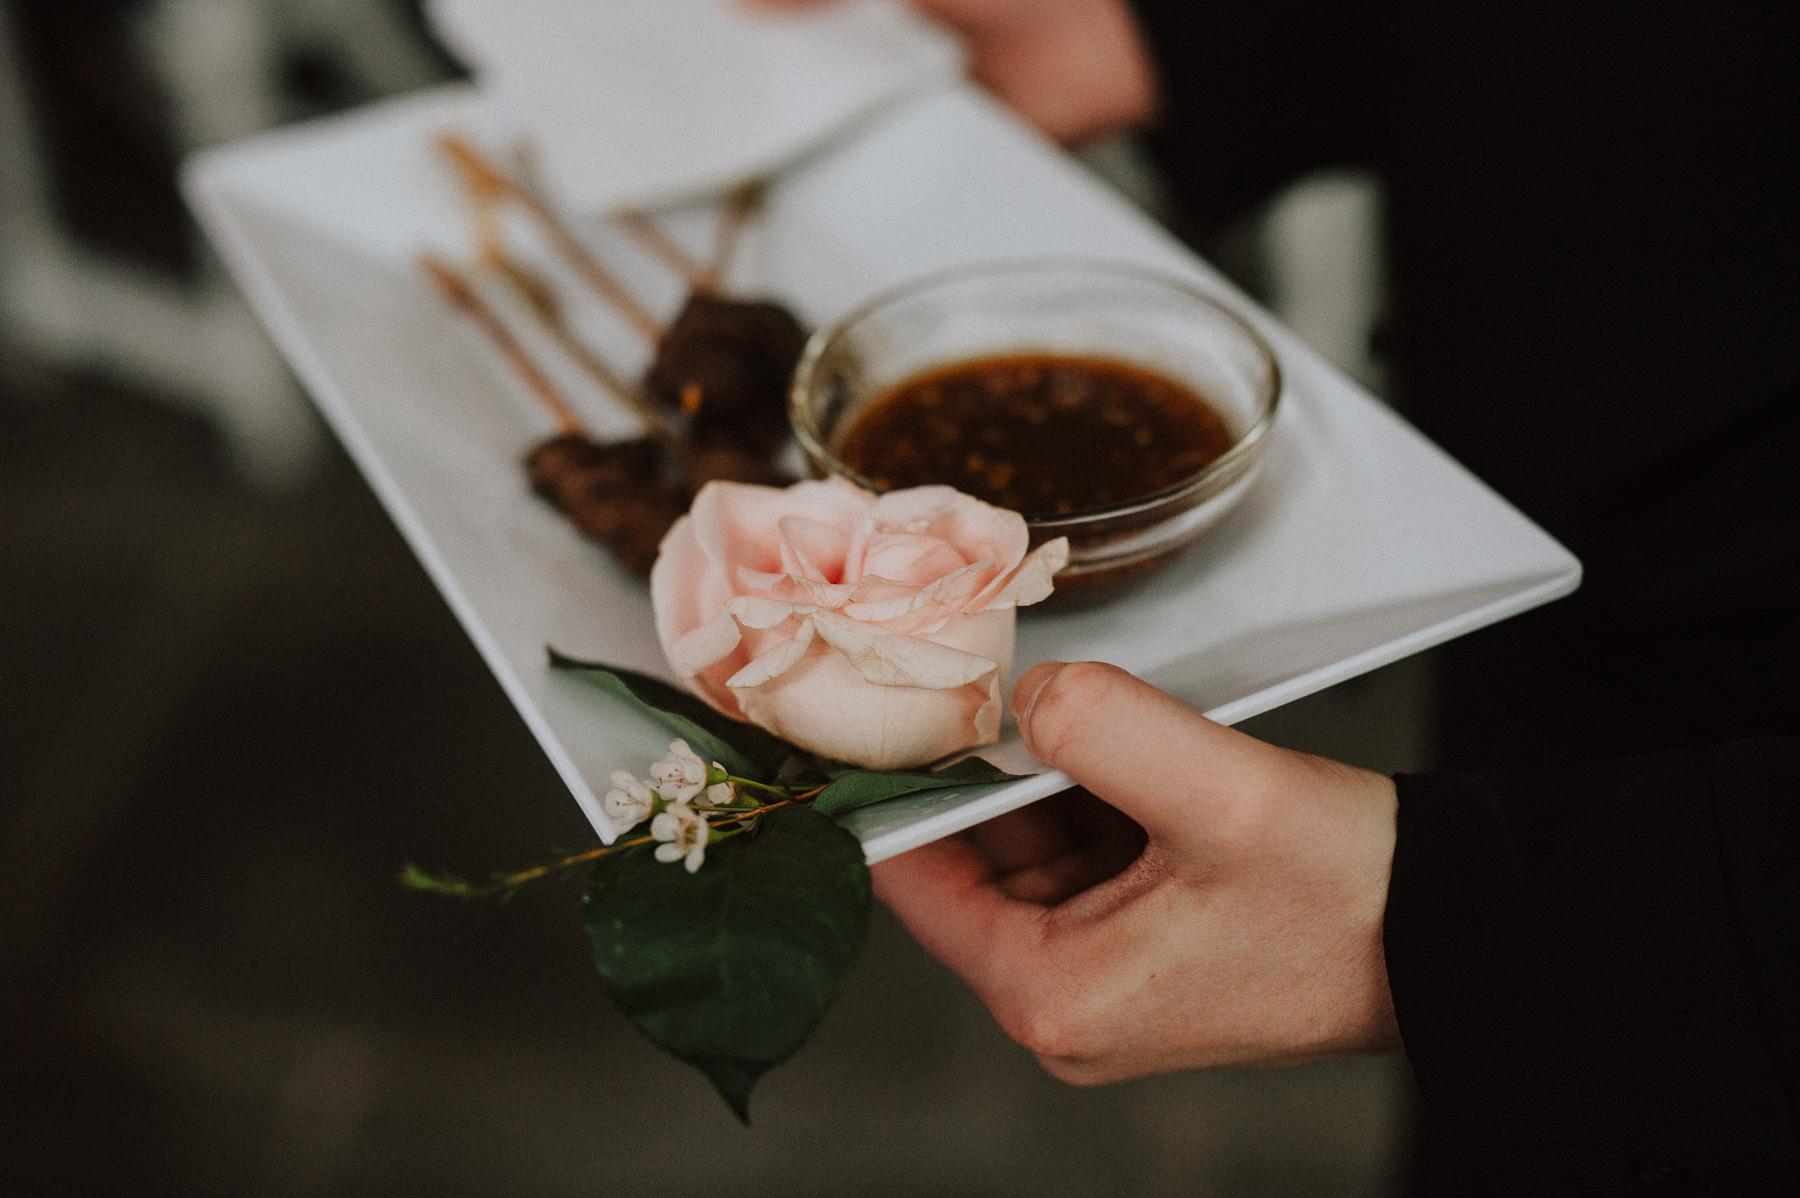 appleford-estate-wedding-photography-72.jpg